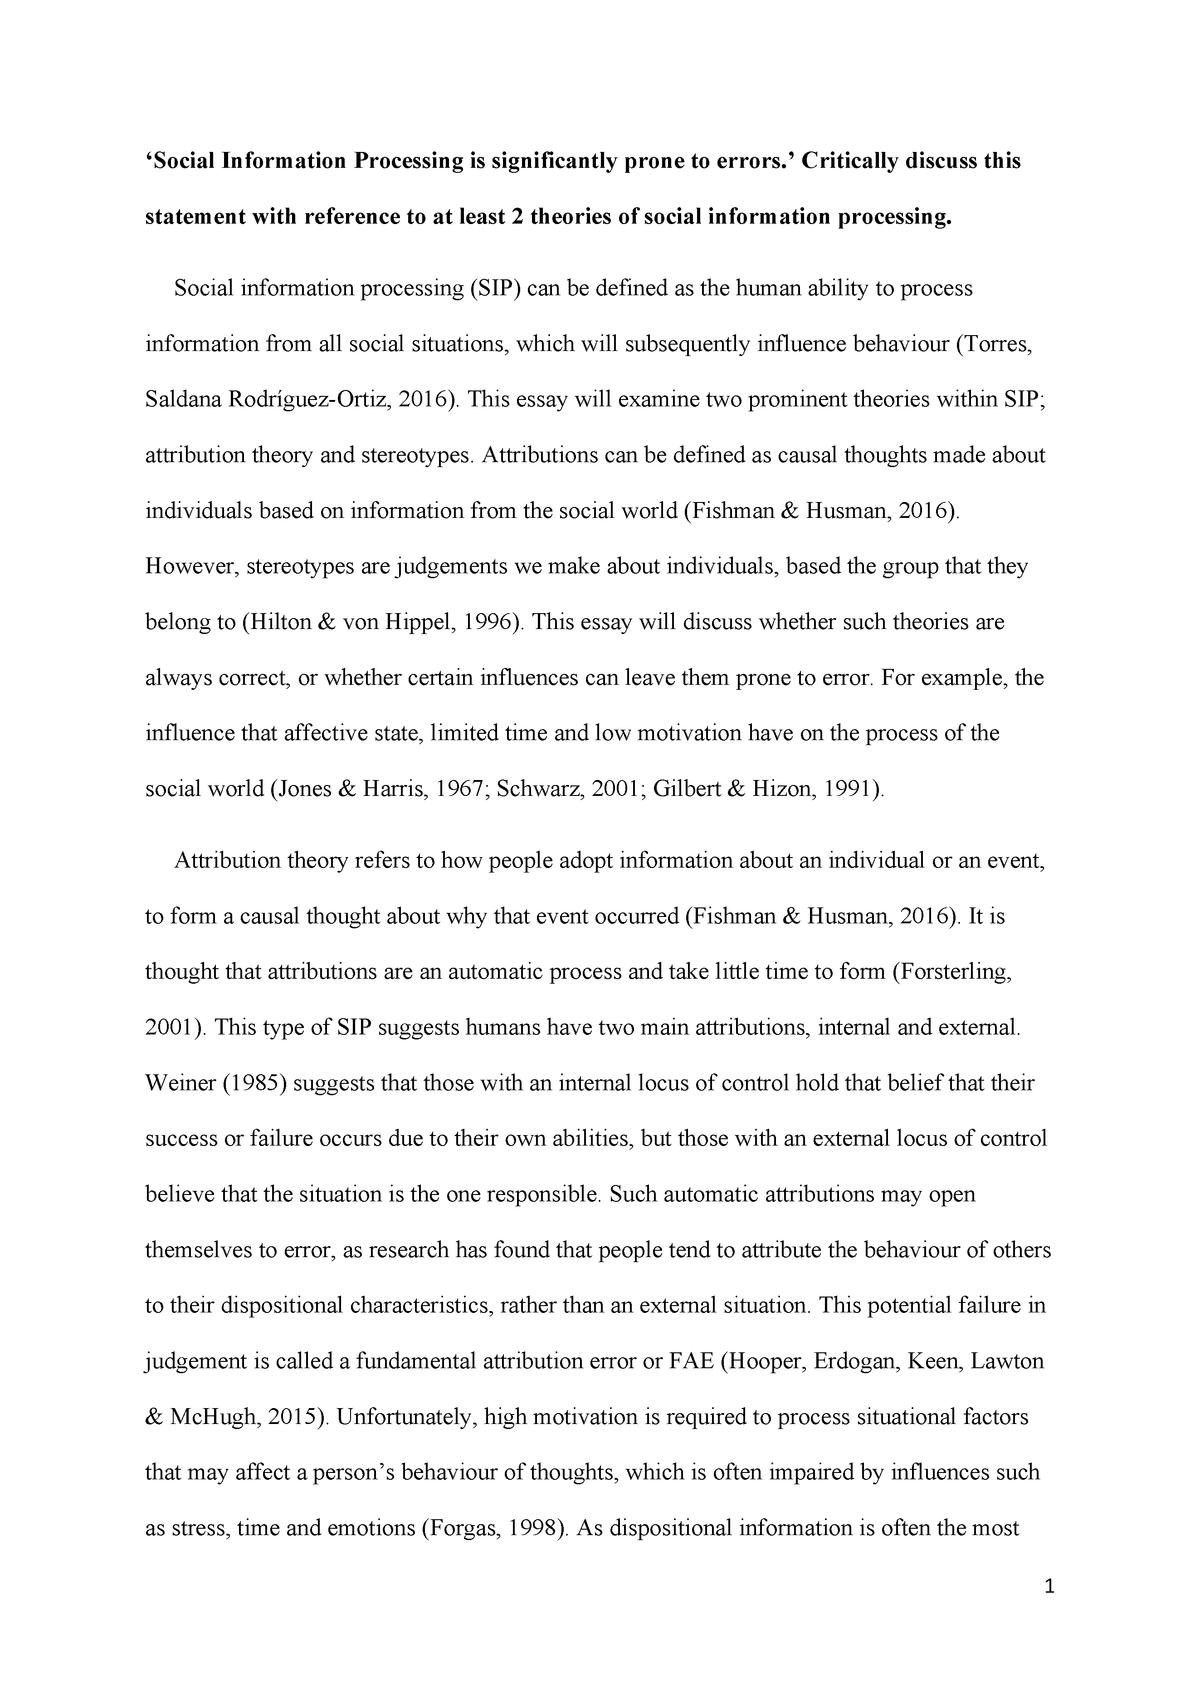 Descriptive essay about a place in nature